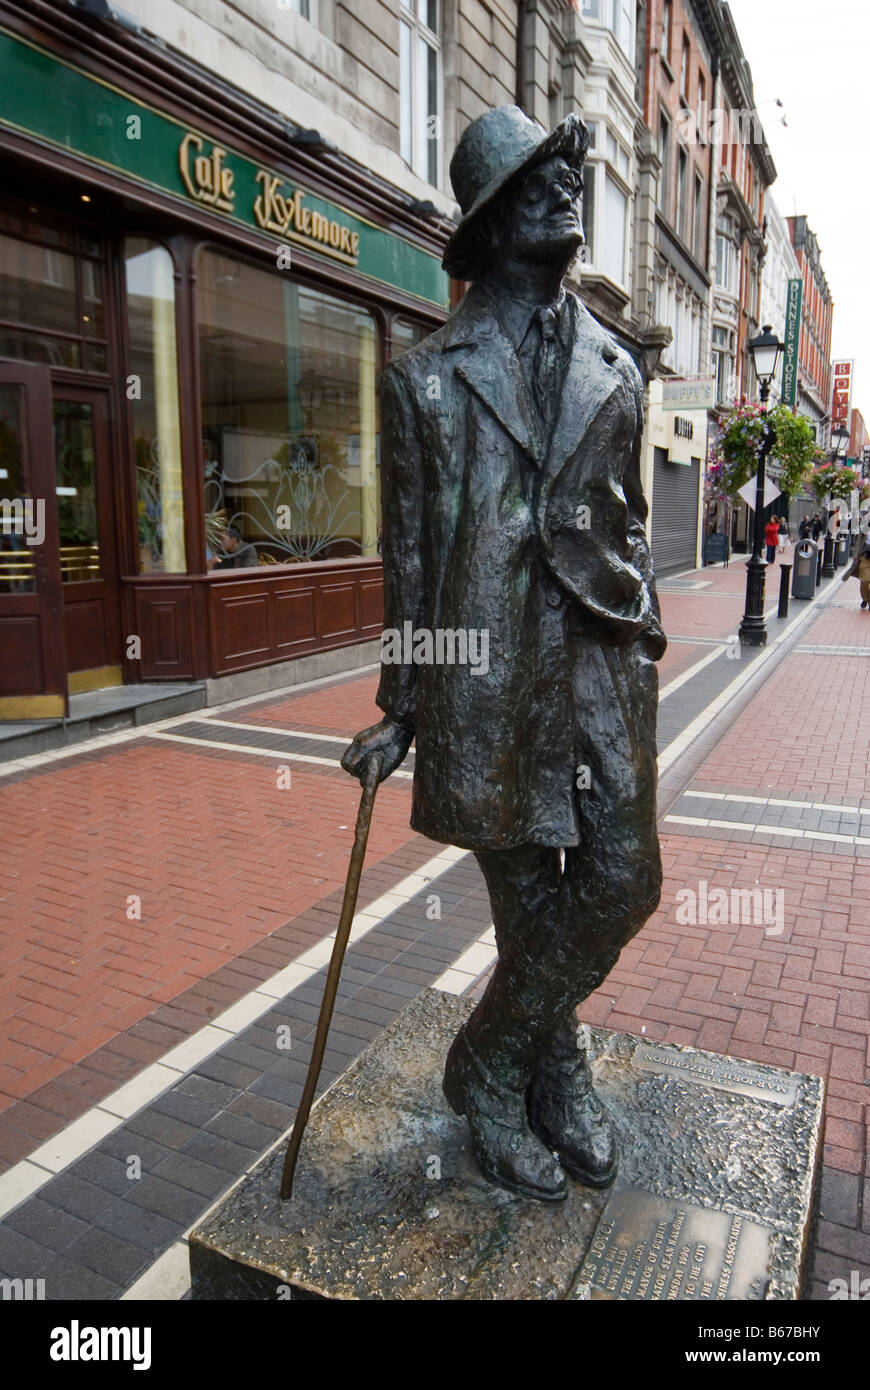 James Joyce Statue in Dublin City Centre - Stock Image